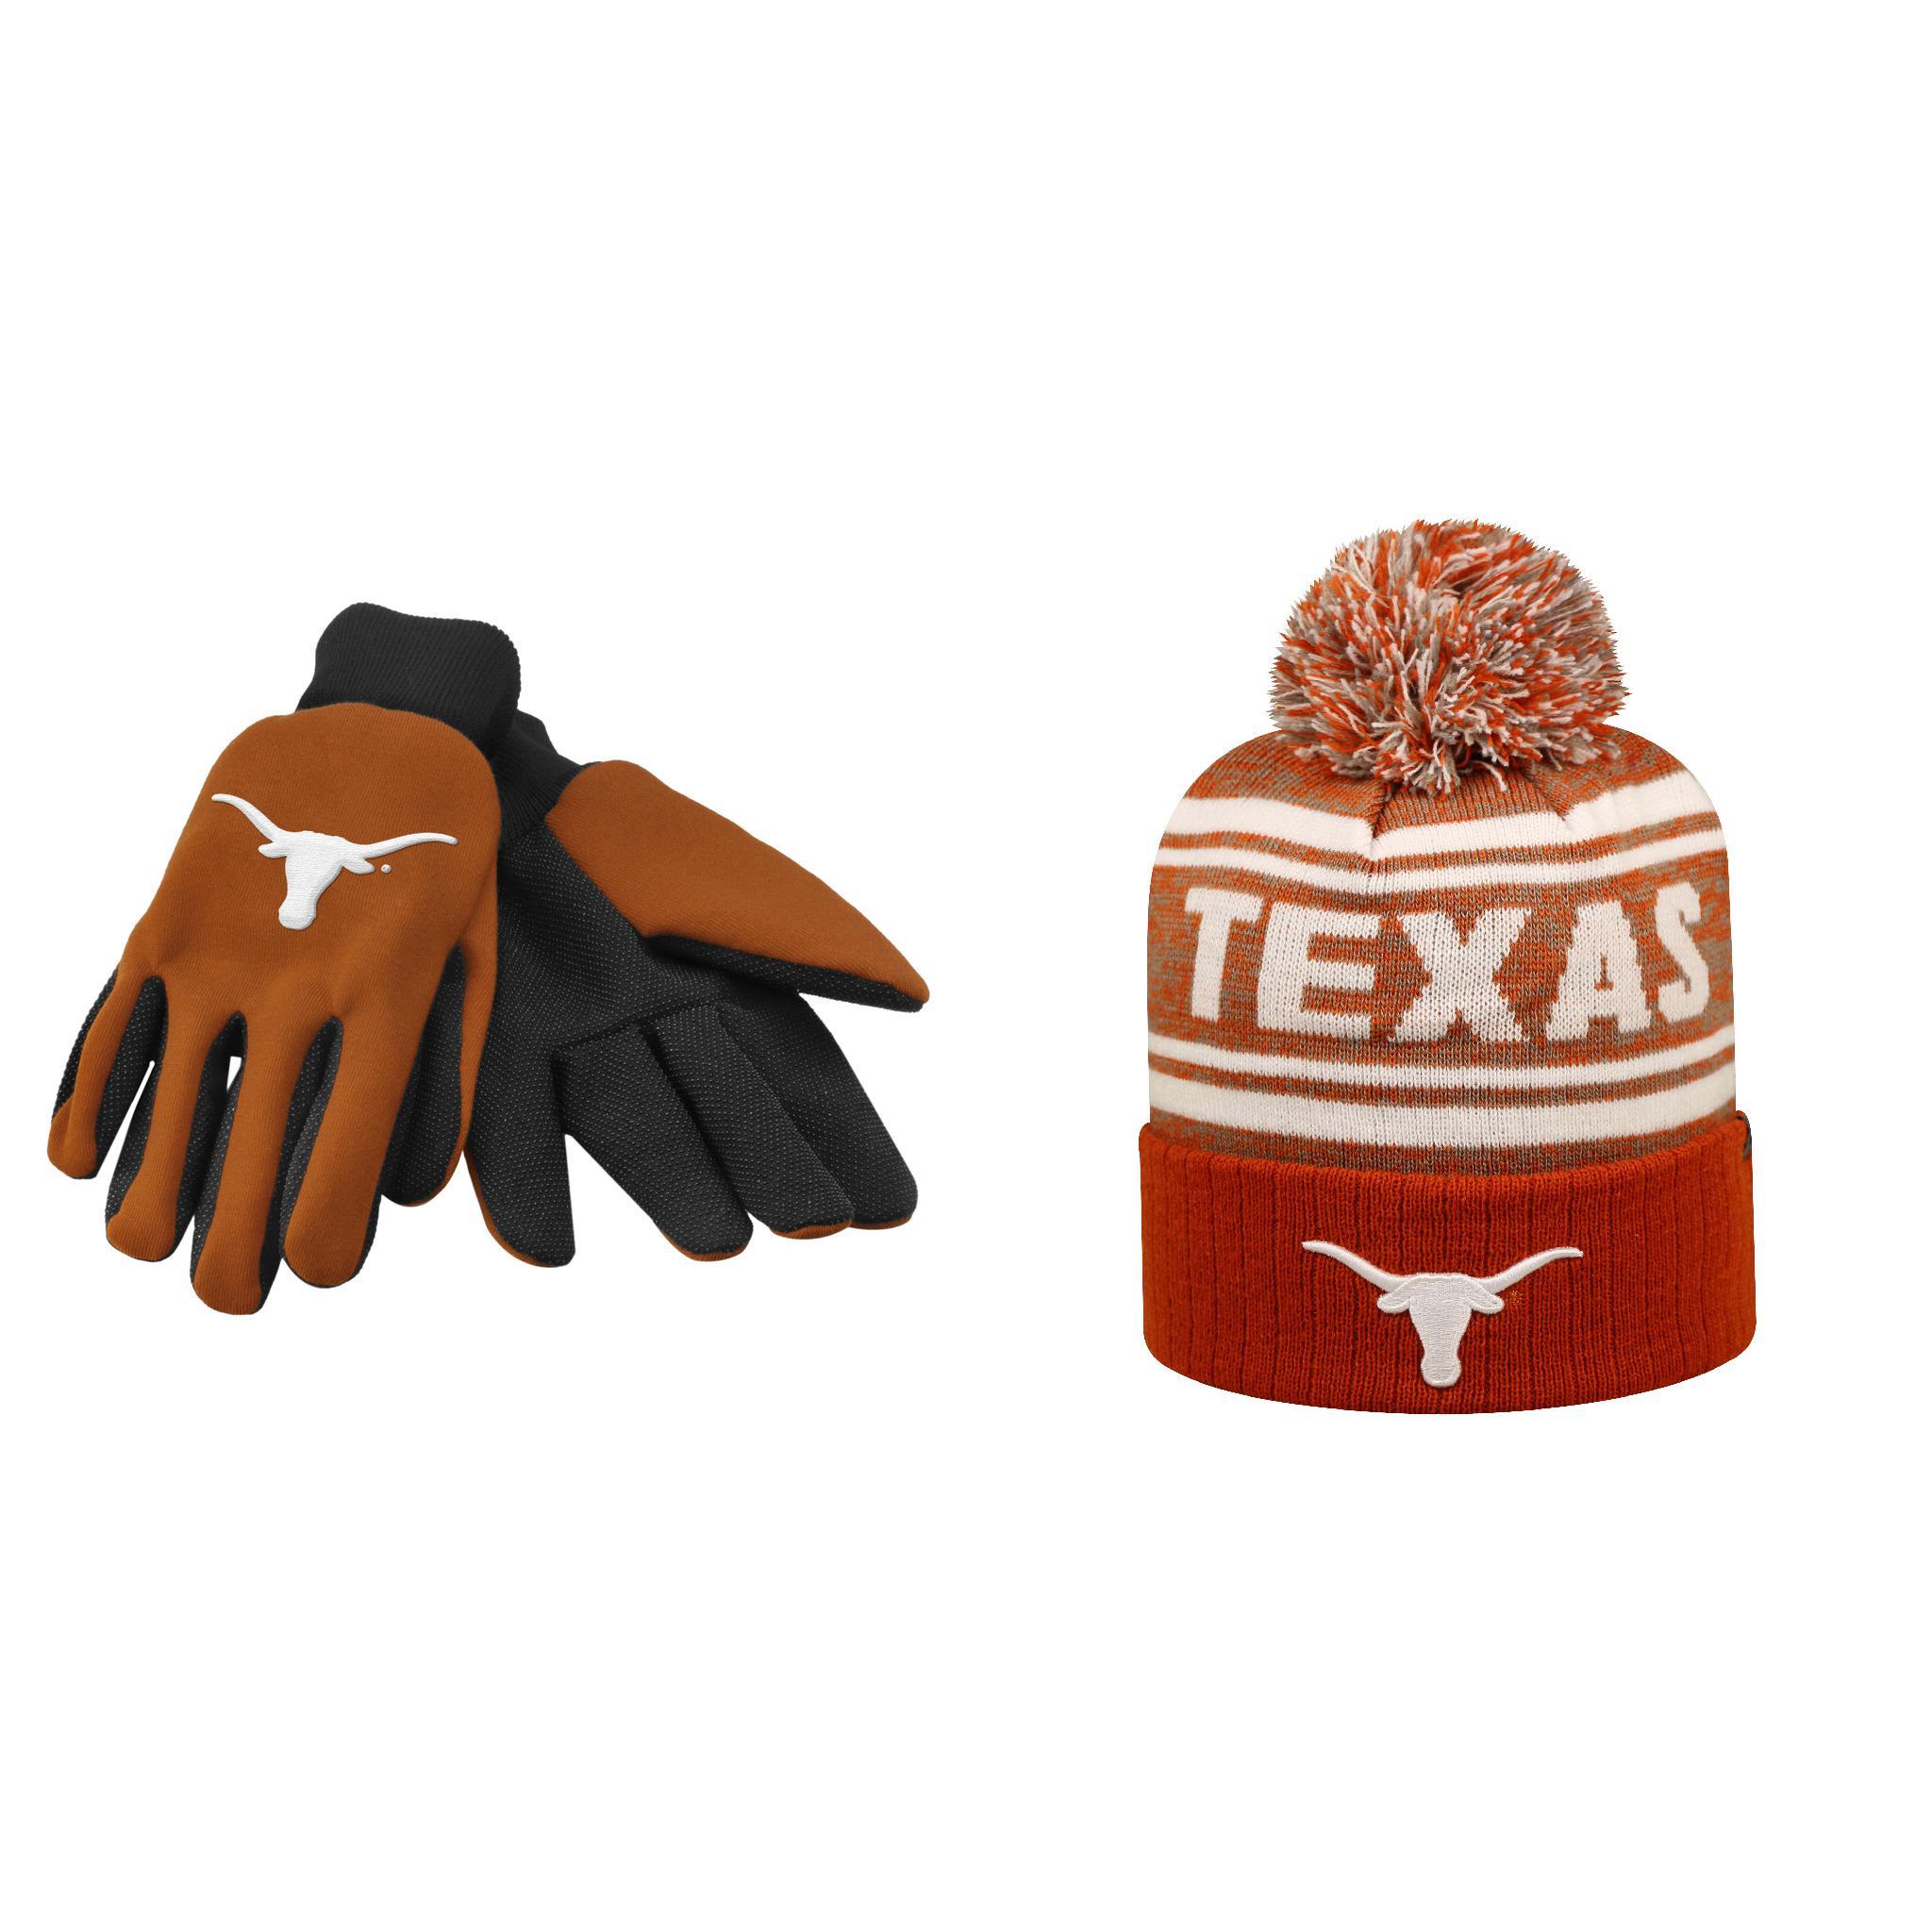 NCAA Texas Longhorns Driven Beanie Hat And Grip Work Glove 2 Pack Bundle